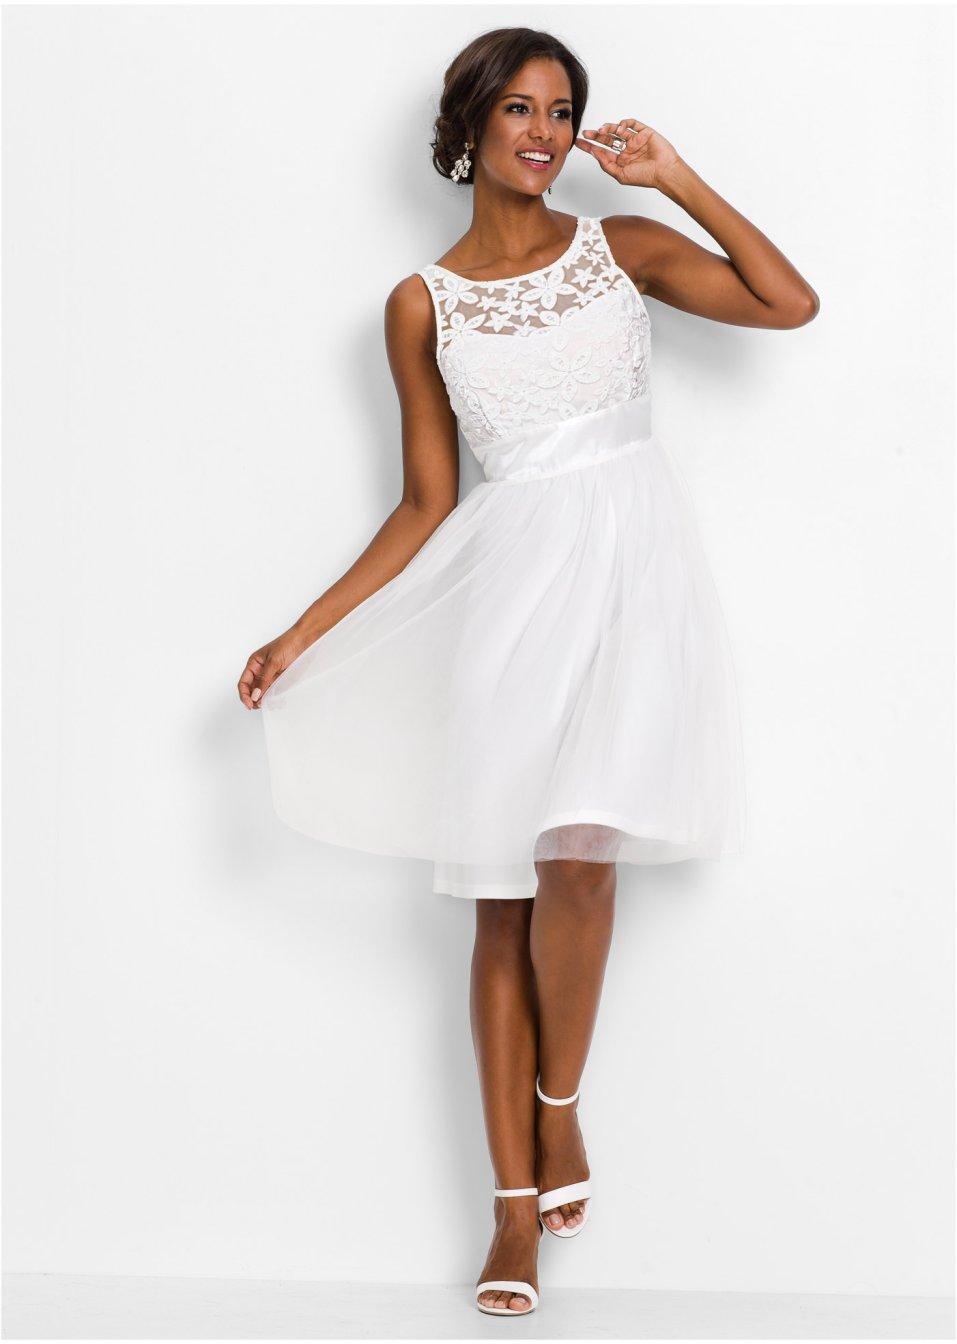 Robe de soirée blanc - Femme - bonprix.fr